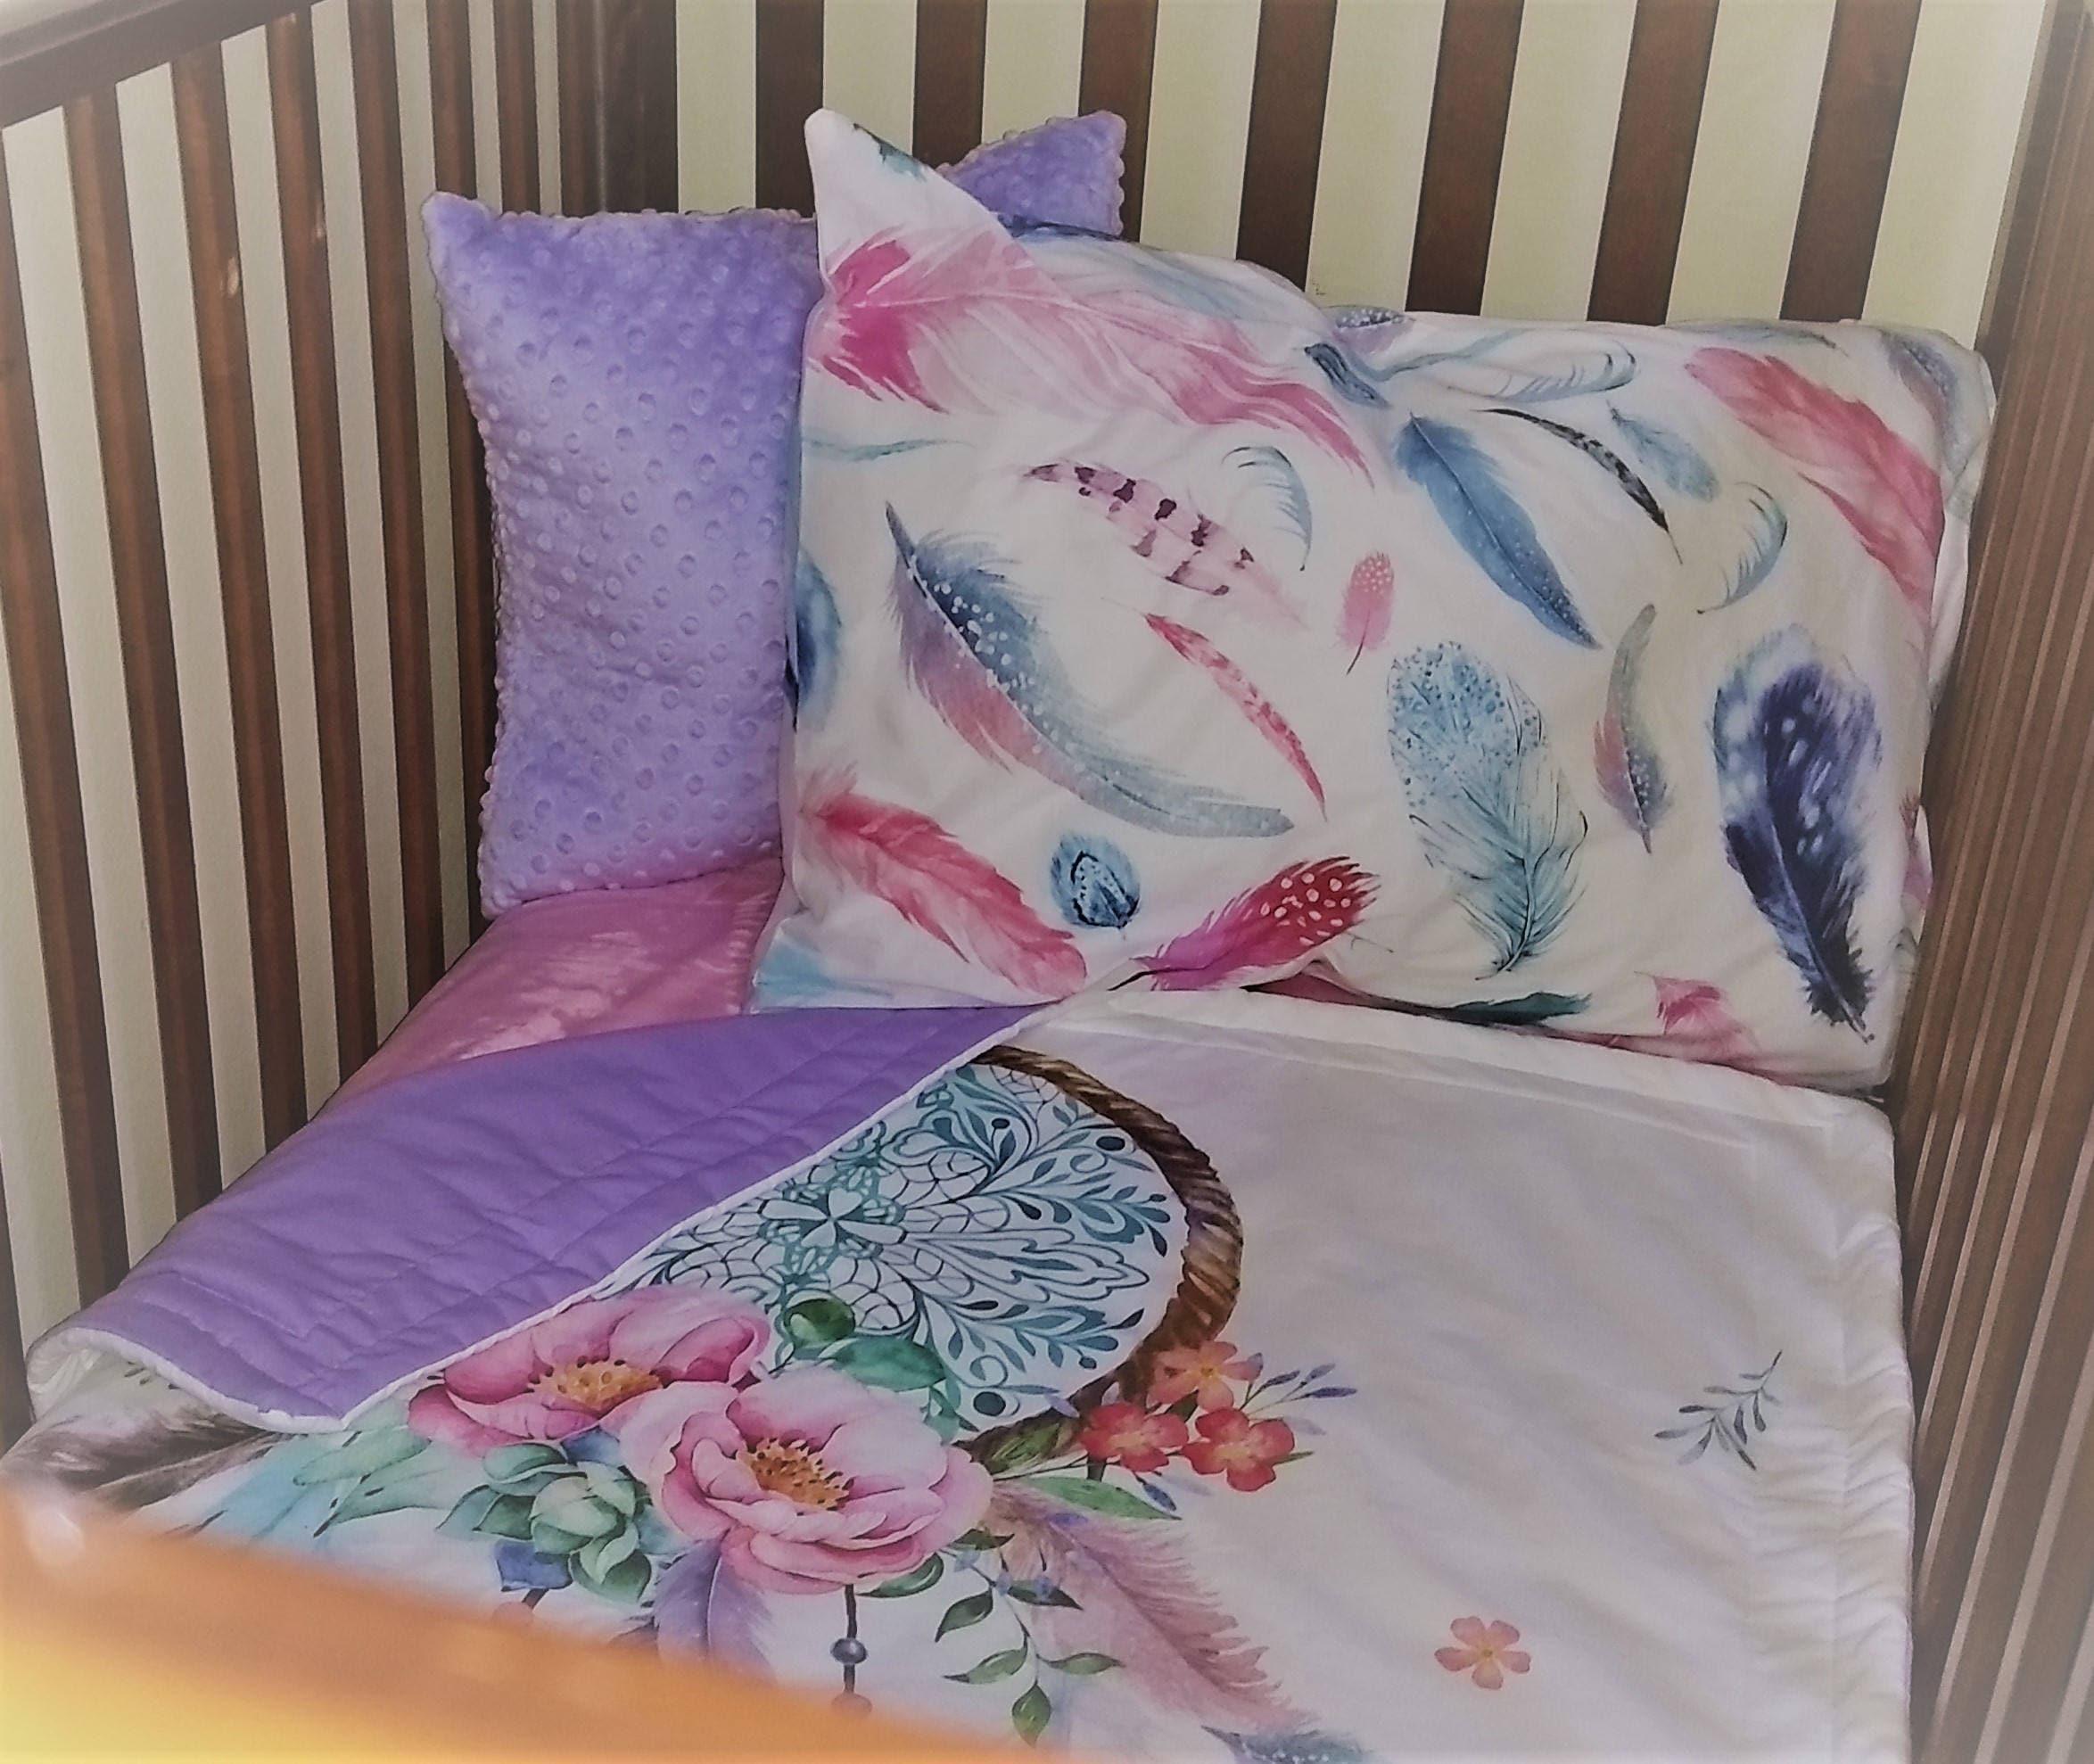 cribs taupe bedding sets baby comforter l for damask bedroom set and pink nursery crib girl